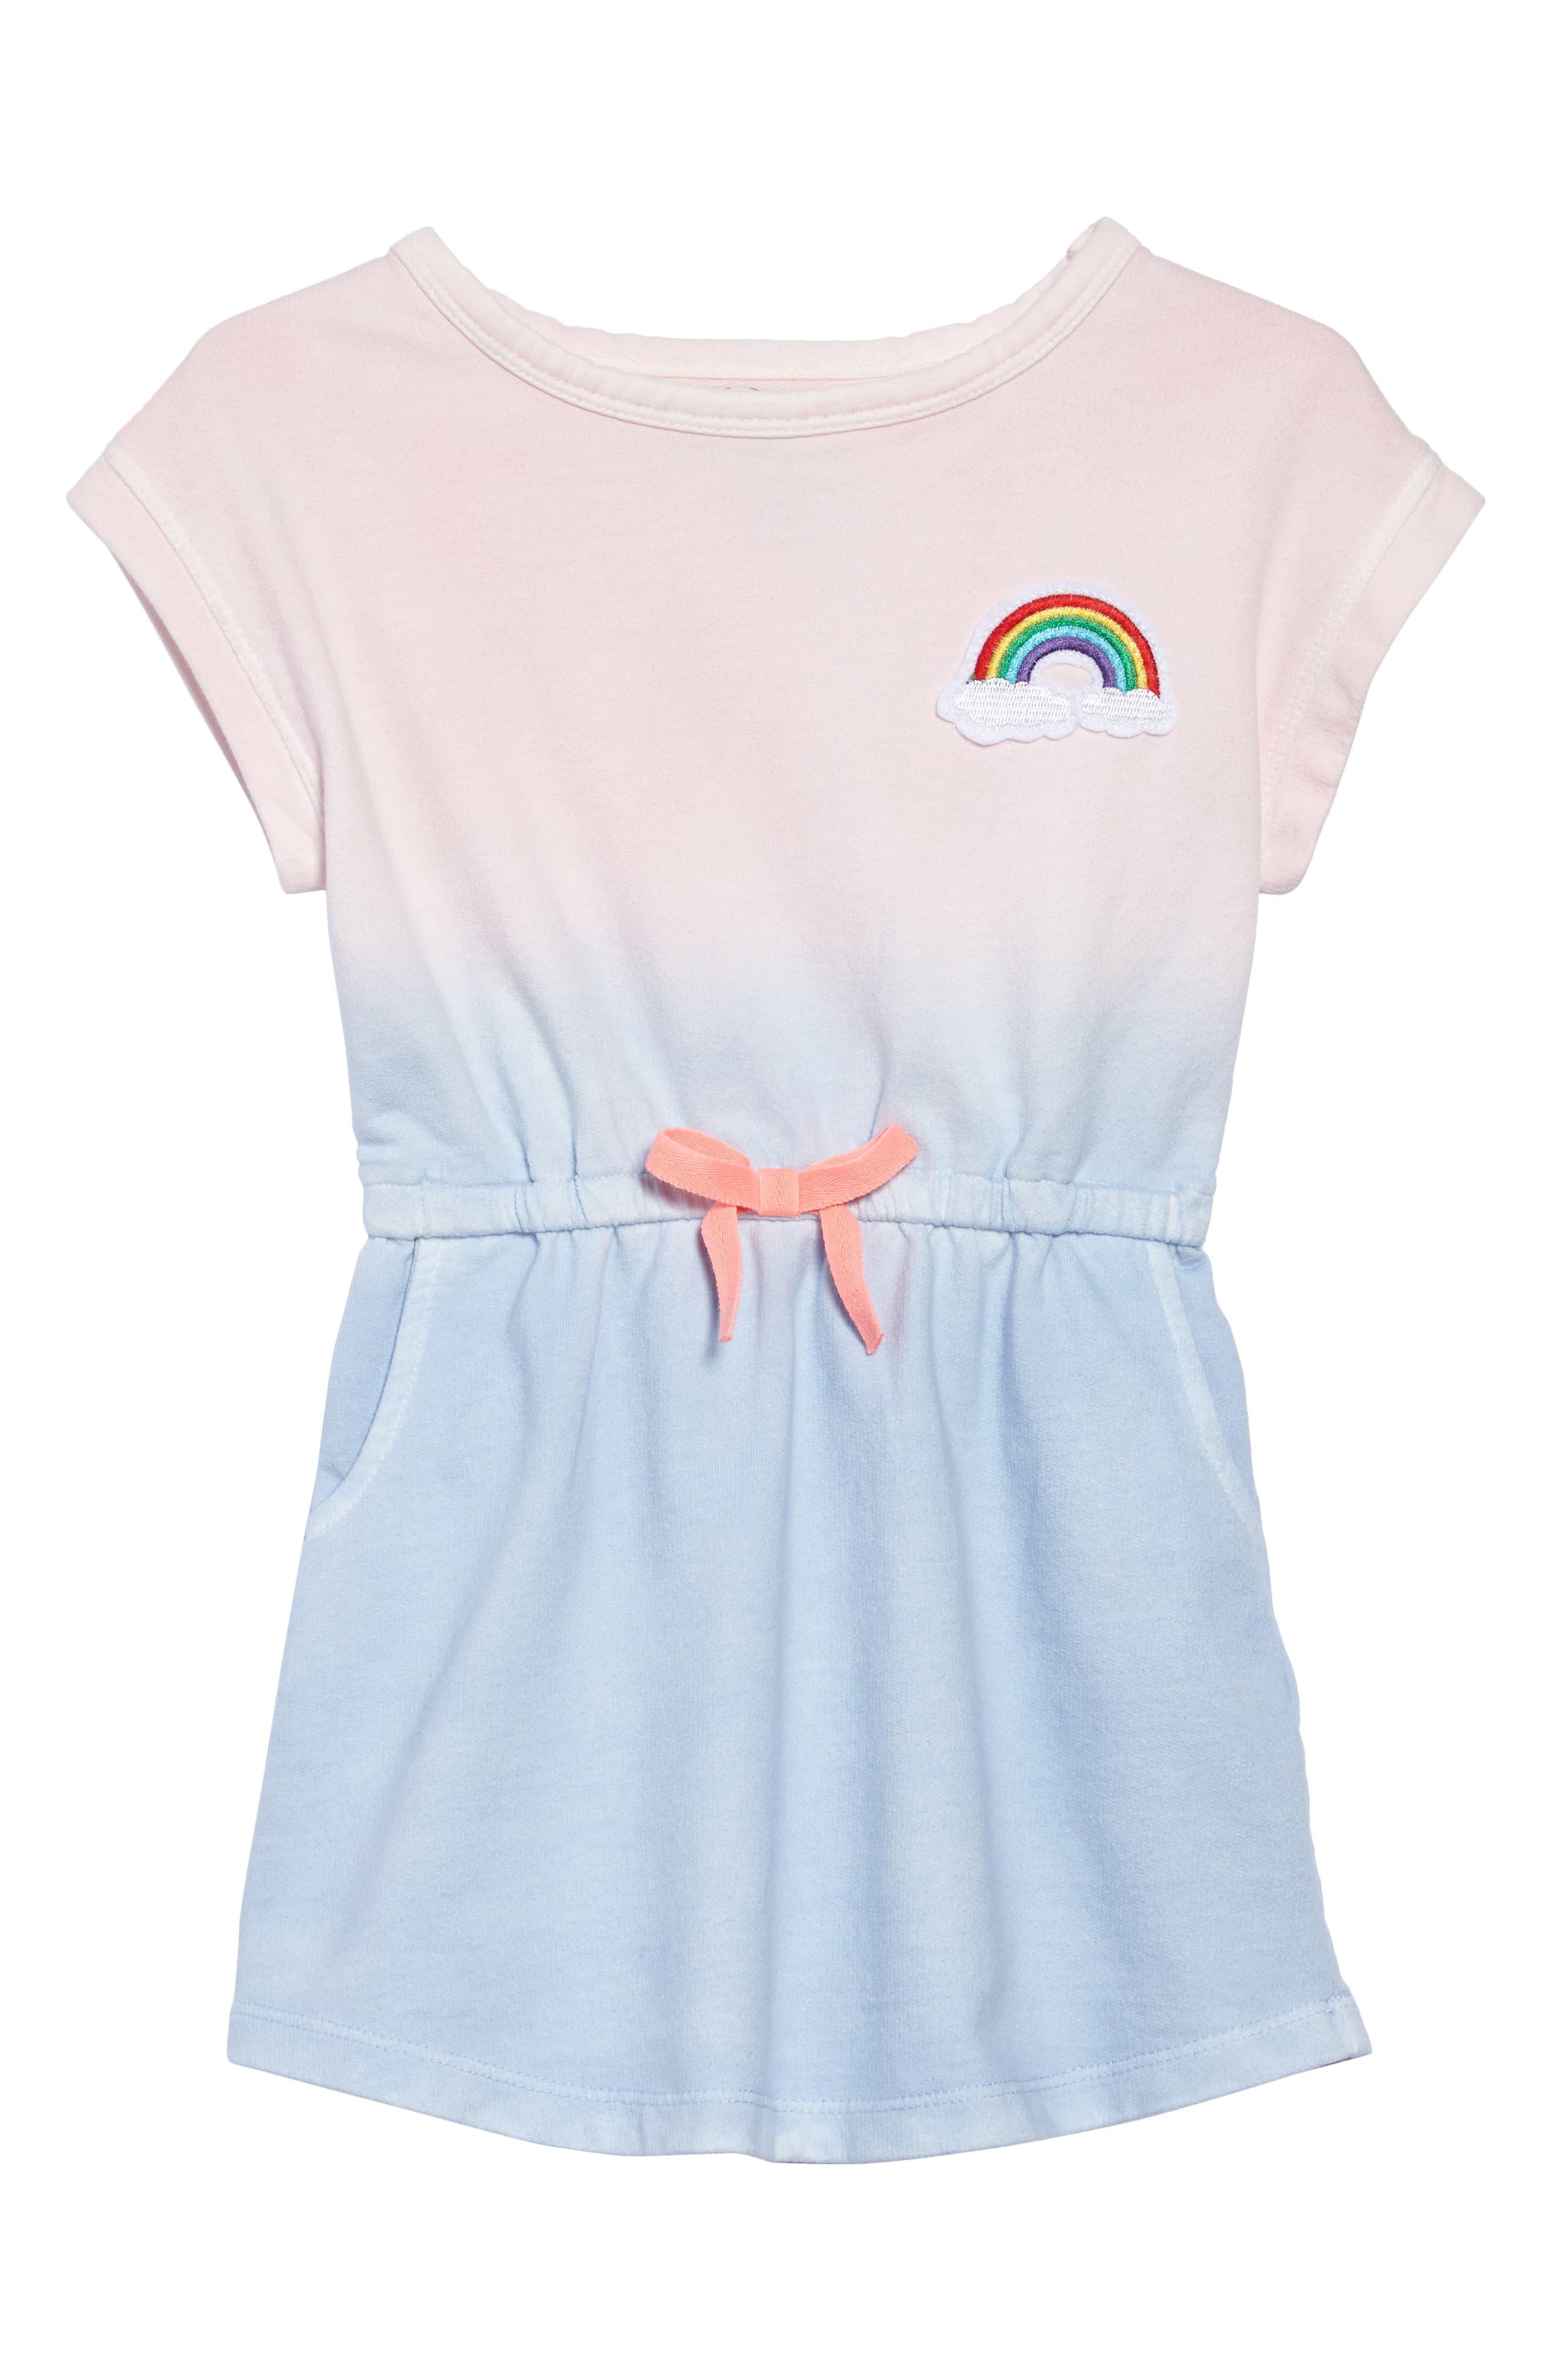 Ombré Dress,                         Main,                         color, Light Pink